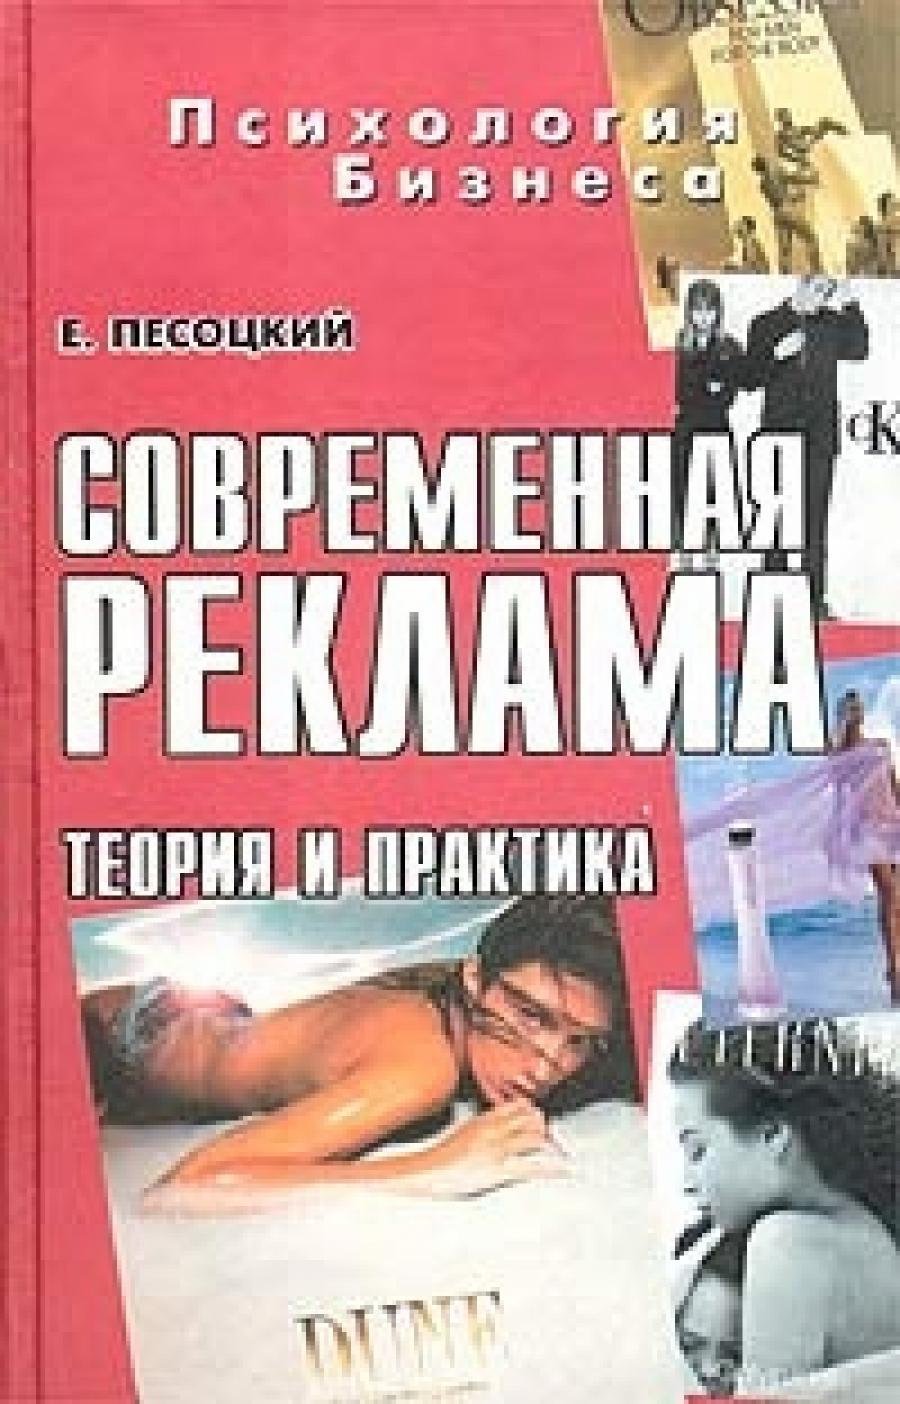 Обложка книги:  e.песоцкий - современная реклама. теория и практика.